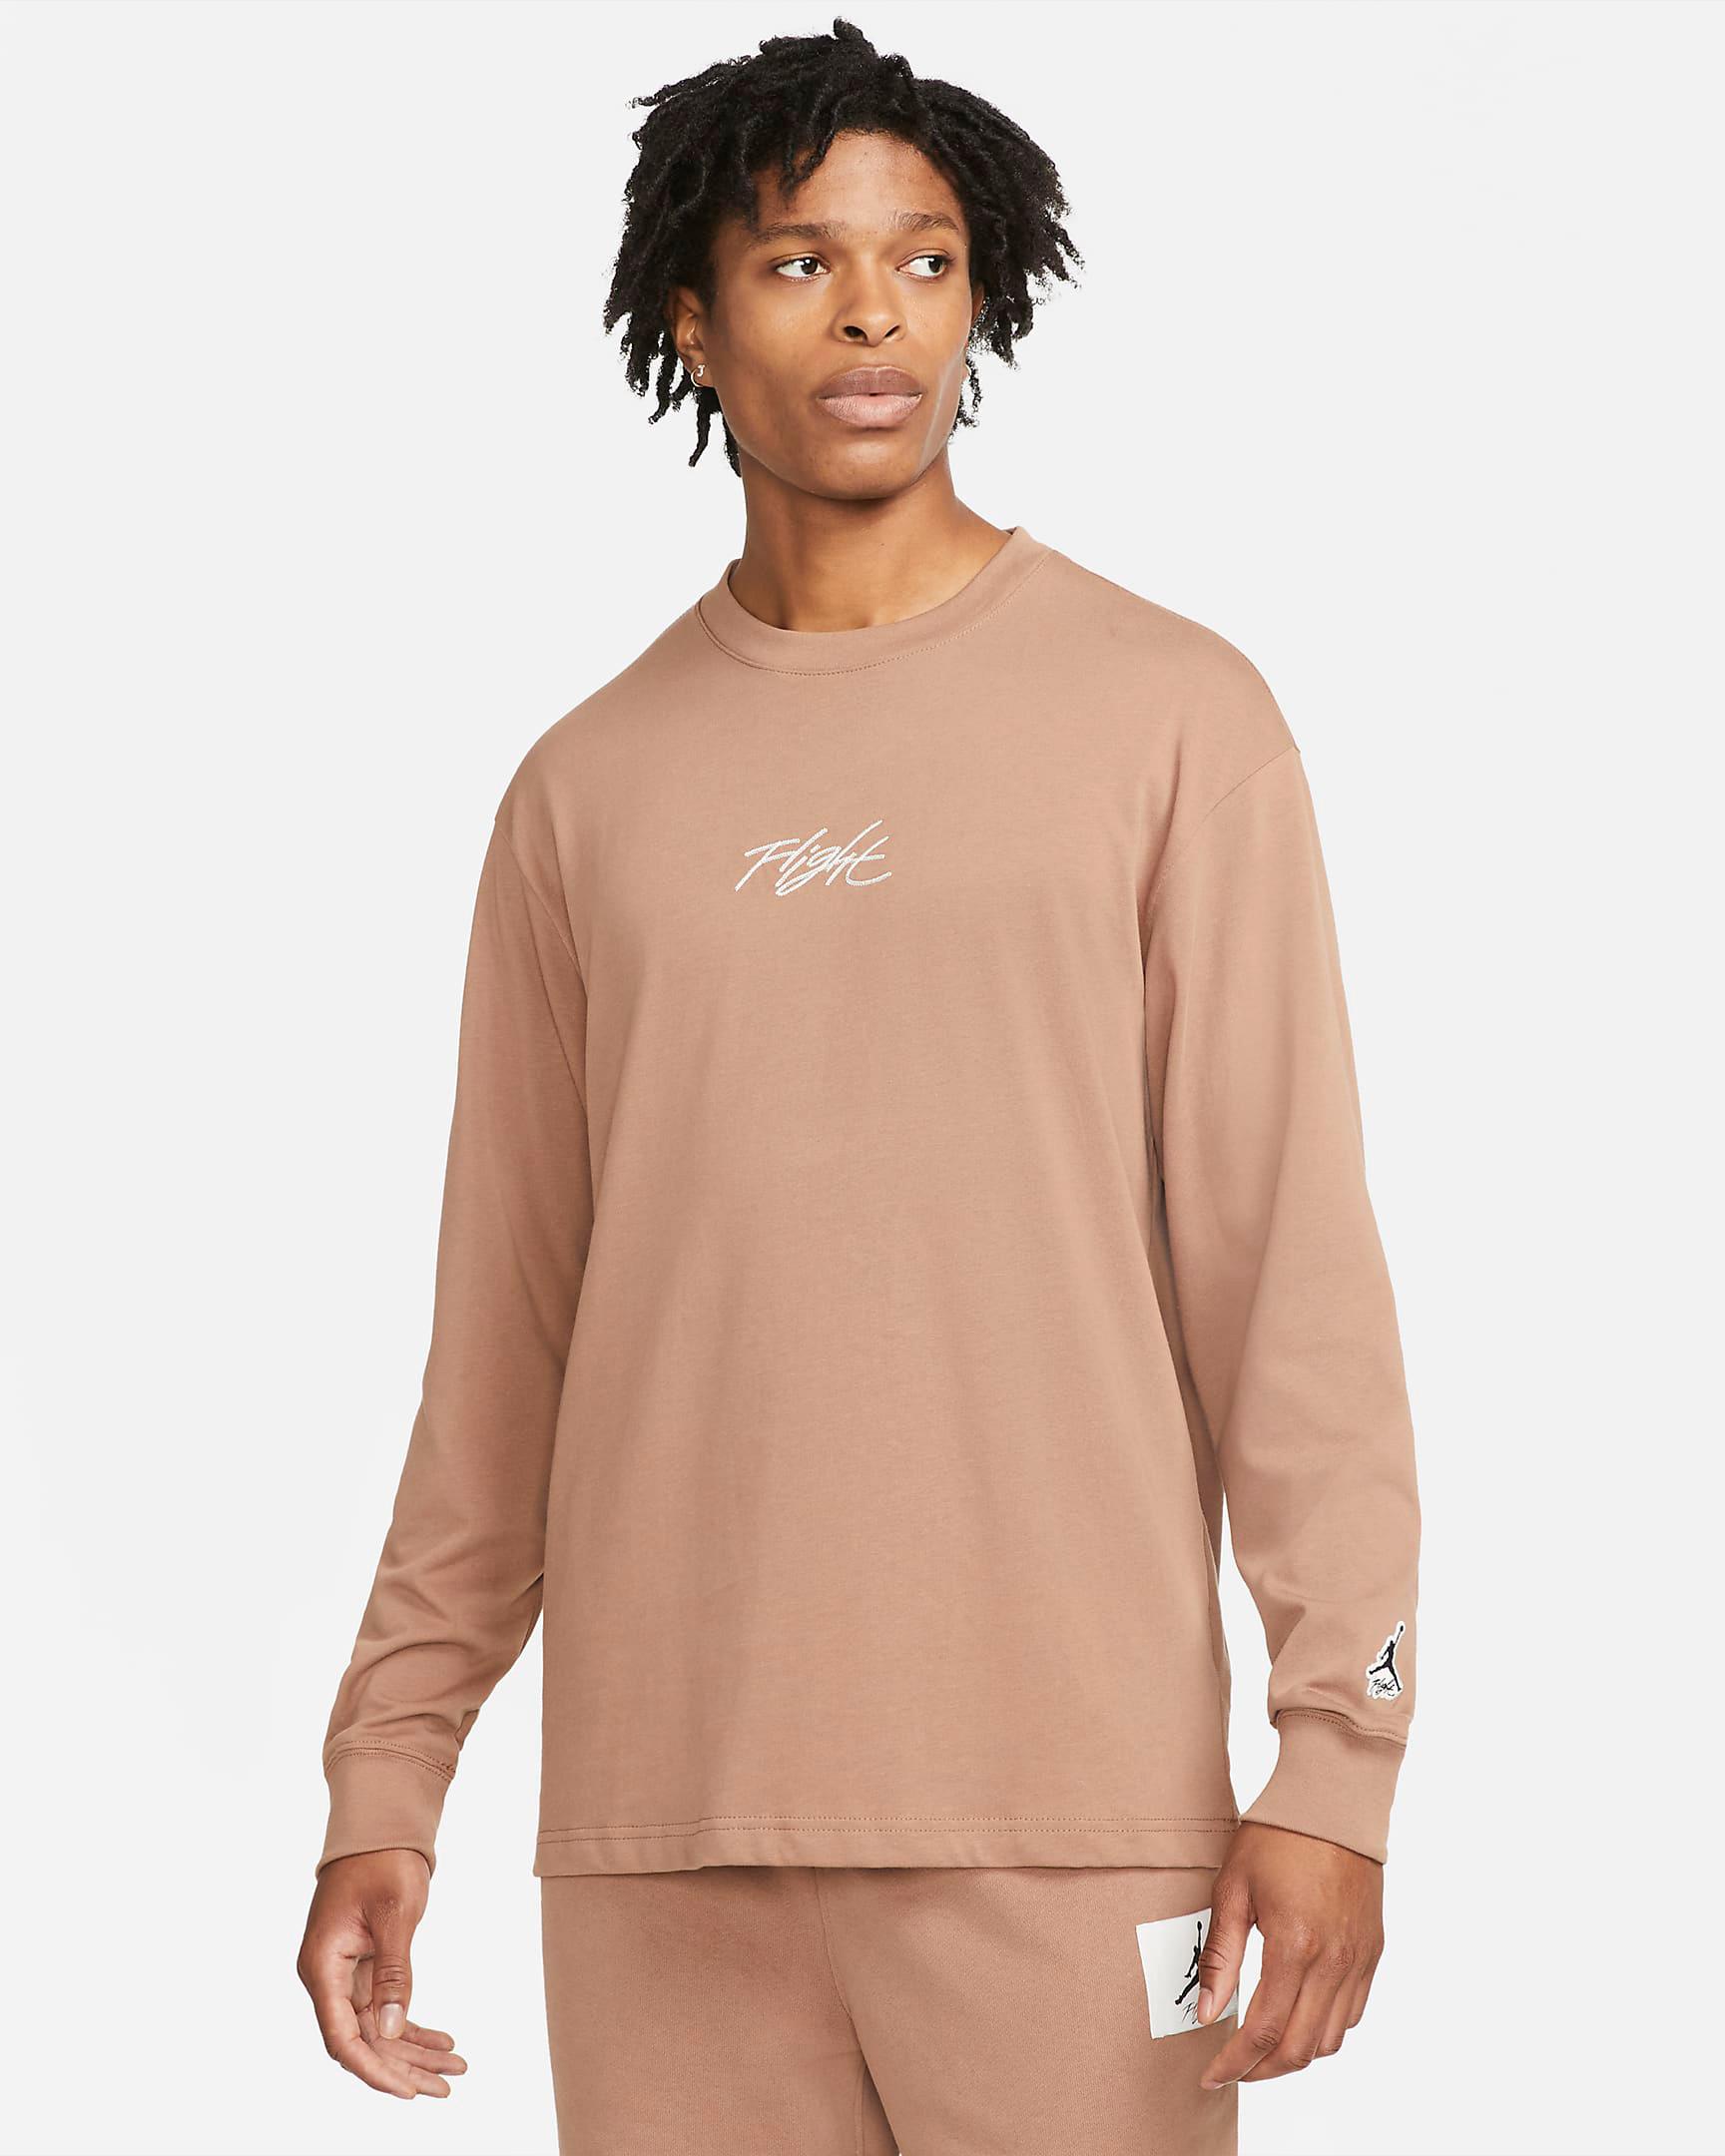 jordan-archaeo-brown-long-sleeve-shirt-1